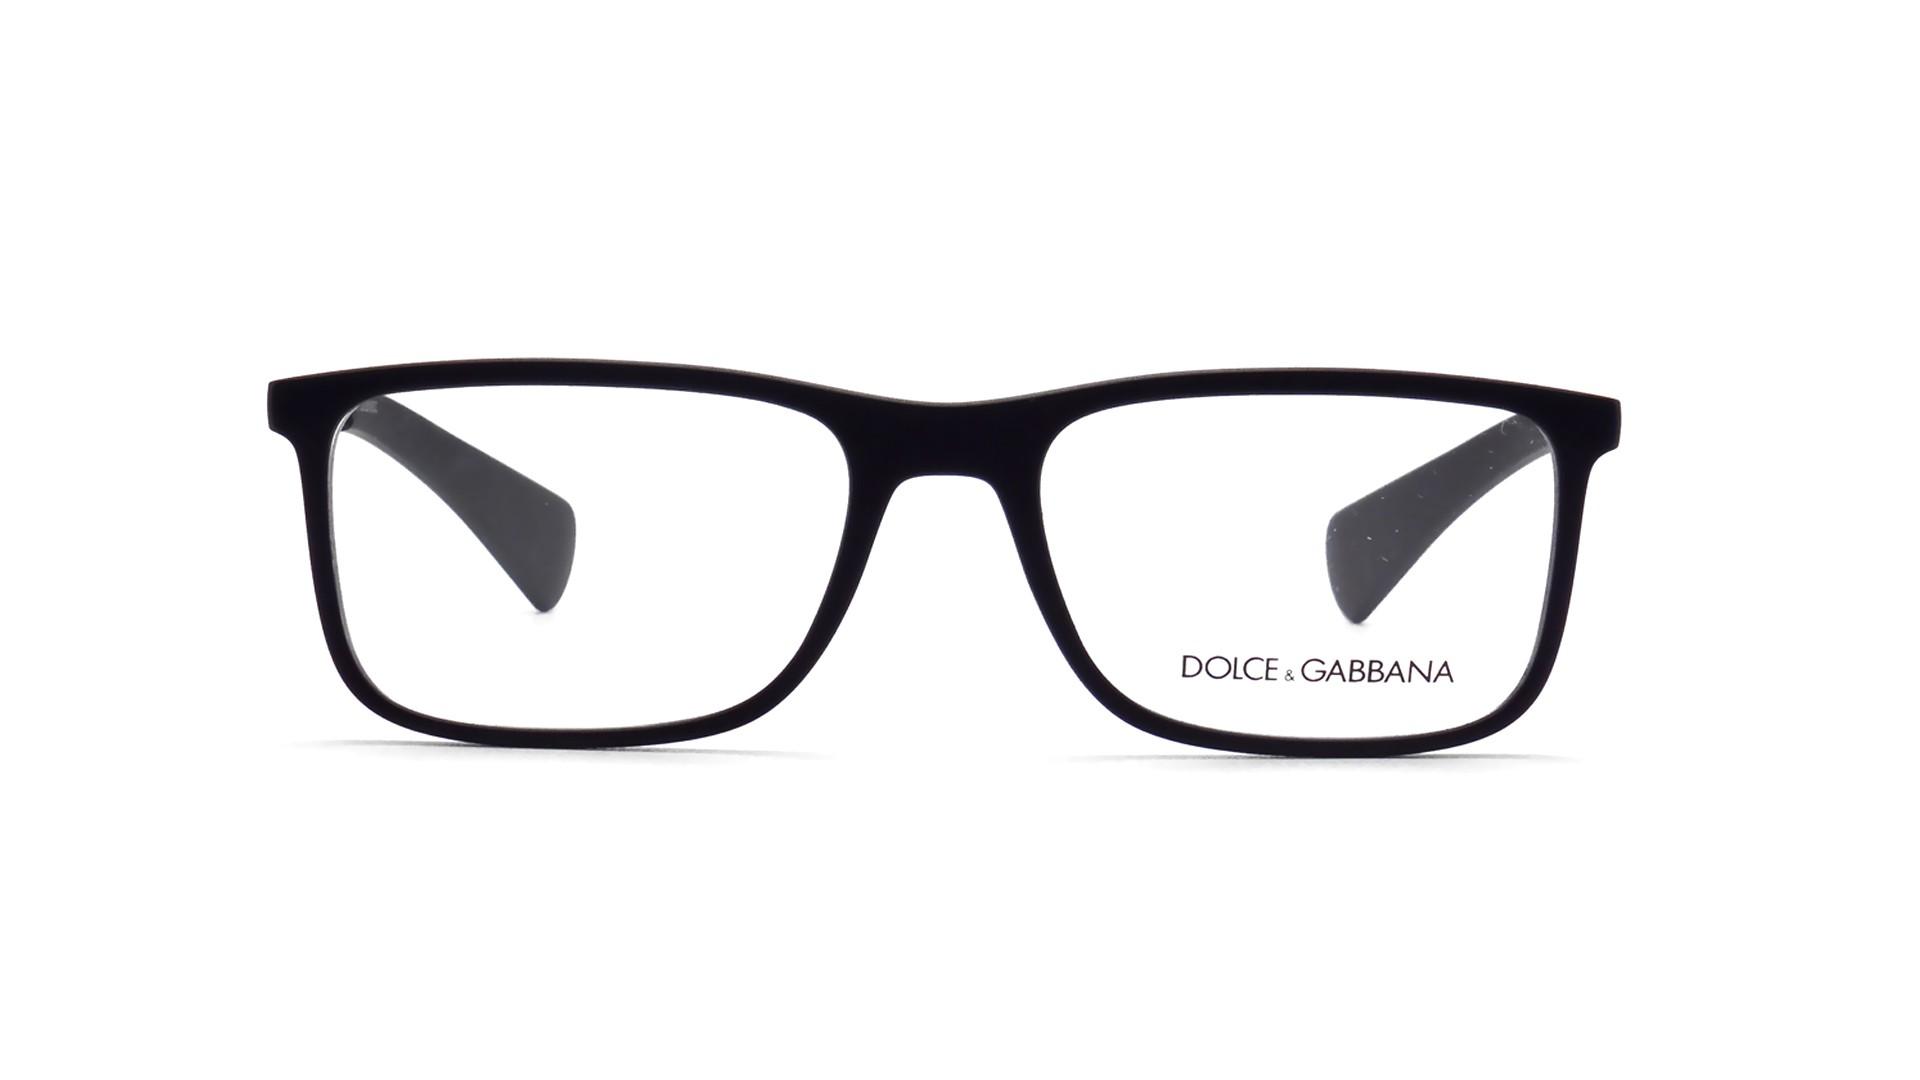 975b09704f9 Dolce   Gabbana DG5017 1934 54-18 Black Mat